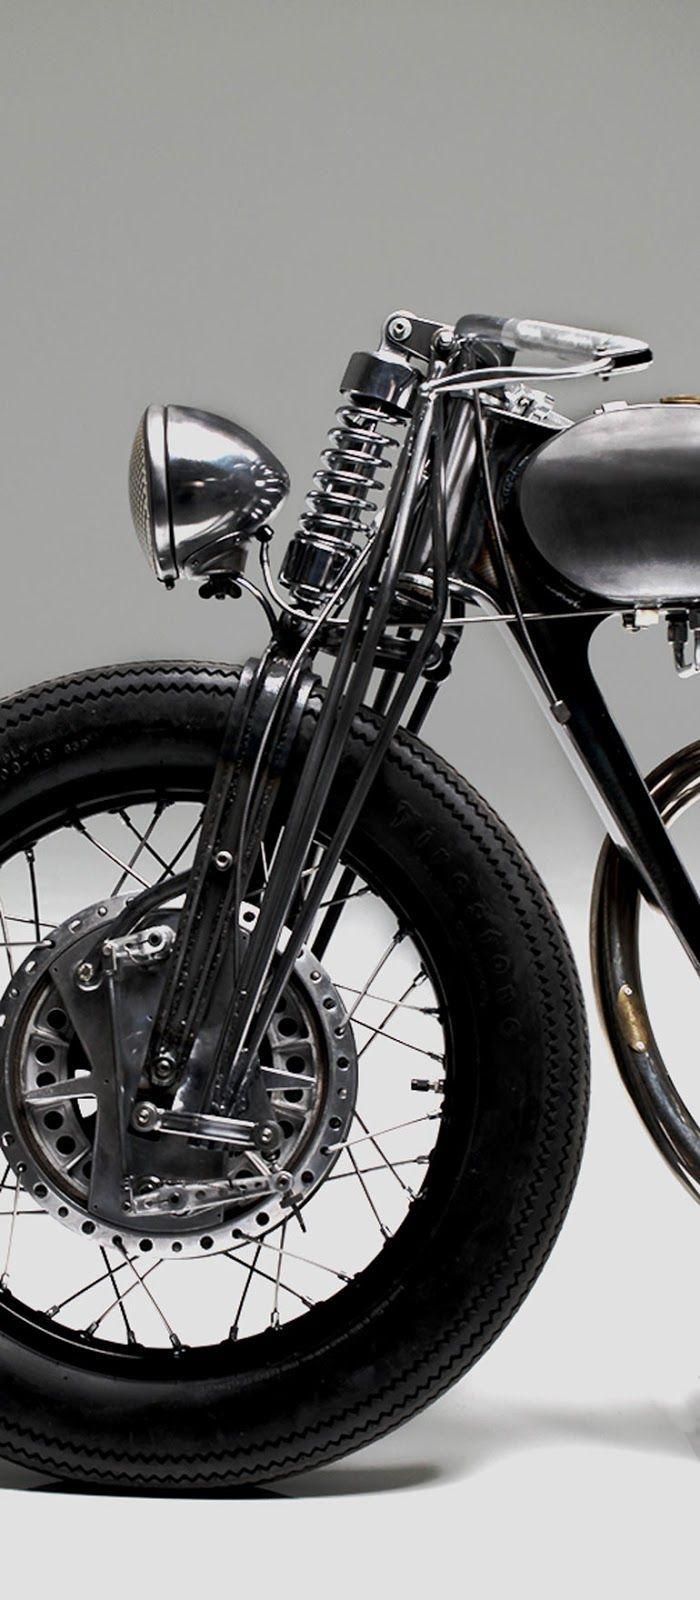 GasCap Motor's Blog: 1996 Royal Enfield Bullet 500 by Hazan Motorworks #Cars-Motorcycles